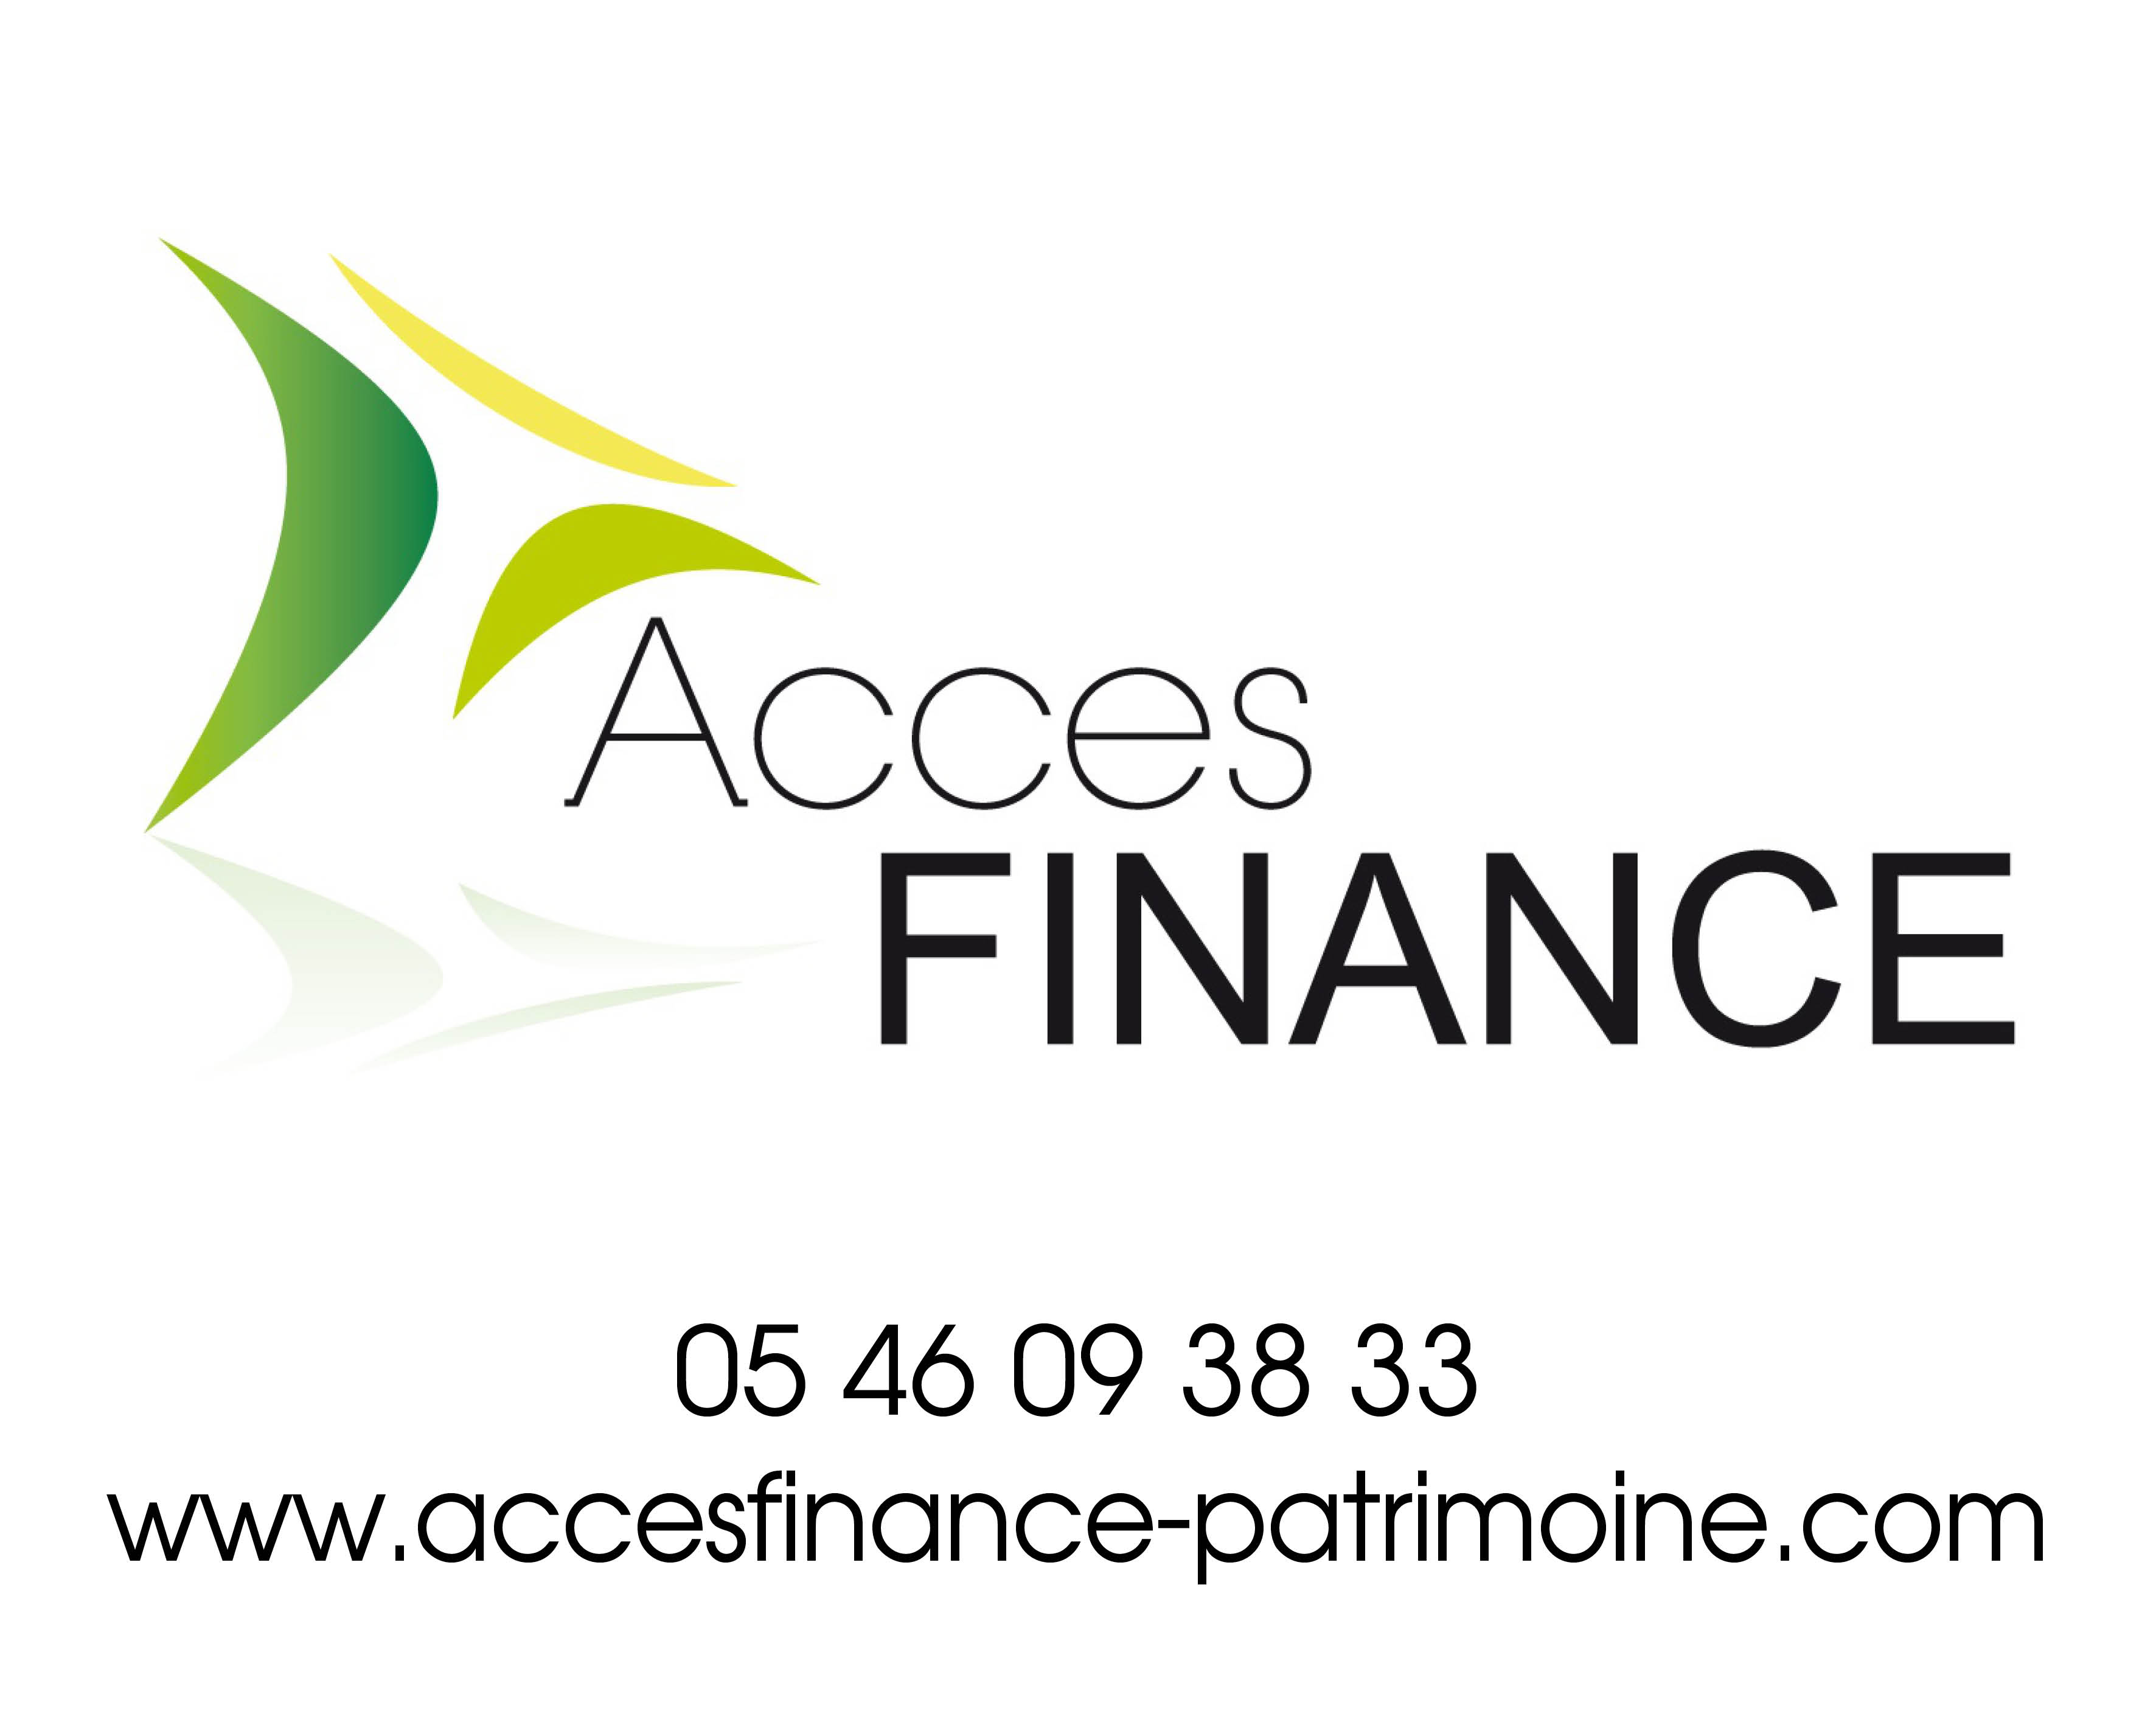 LOGO PARTENAIRE 24x30_36accesfinance